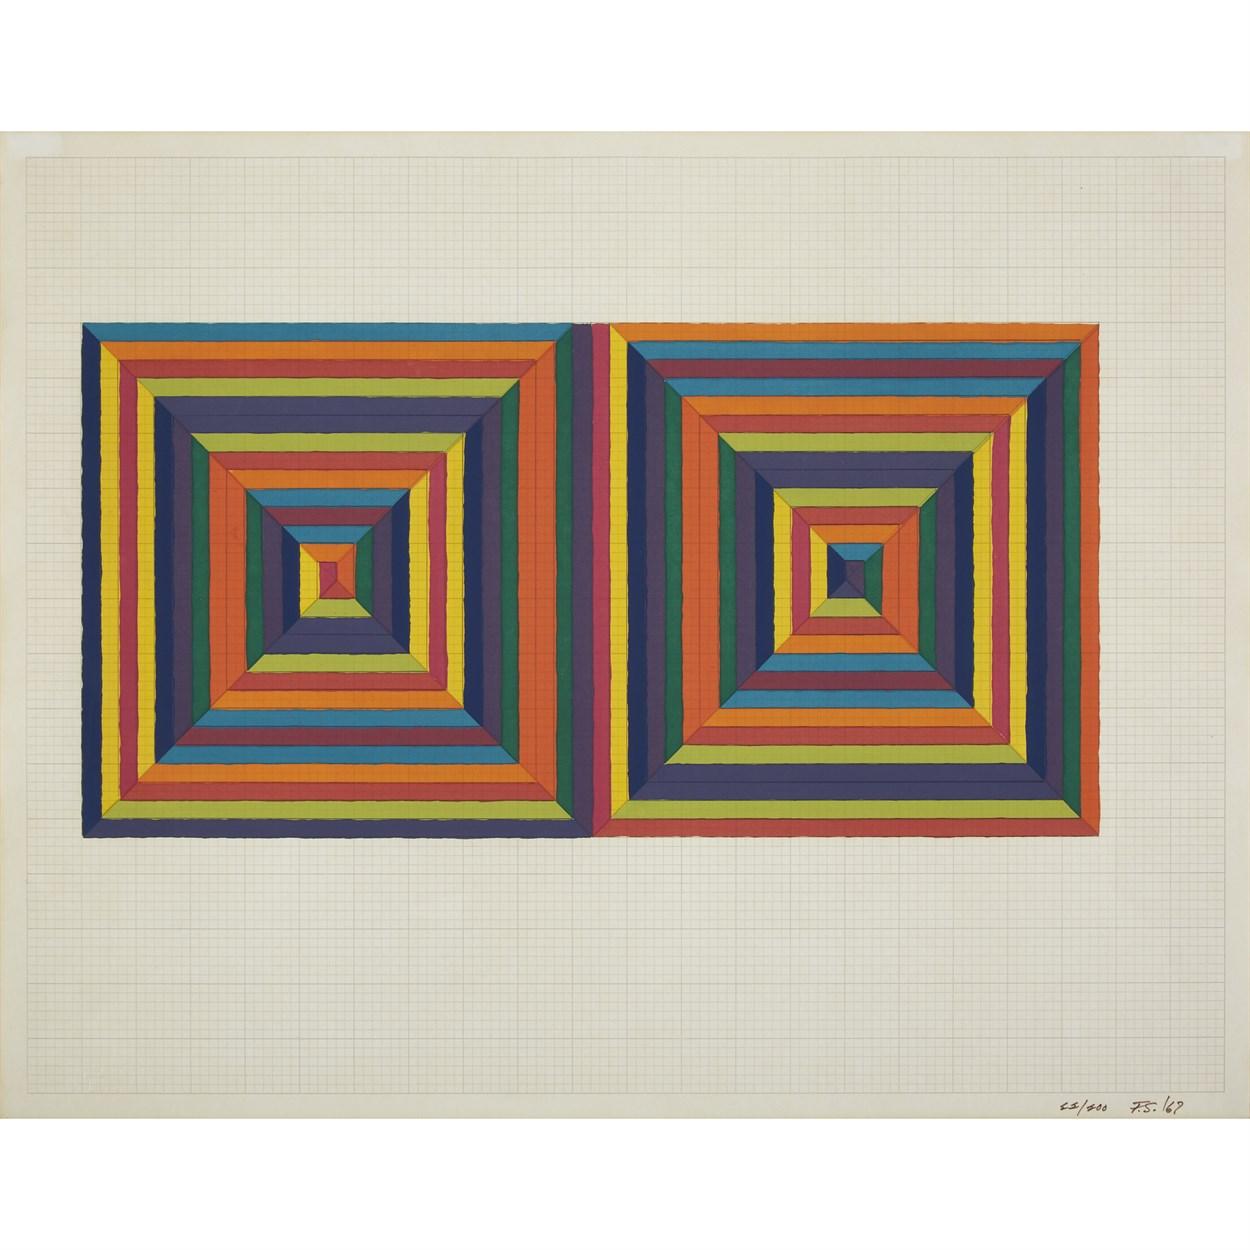 Lot 40 - Frank Stella (American, b. 1936)